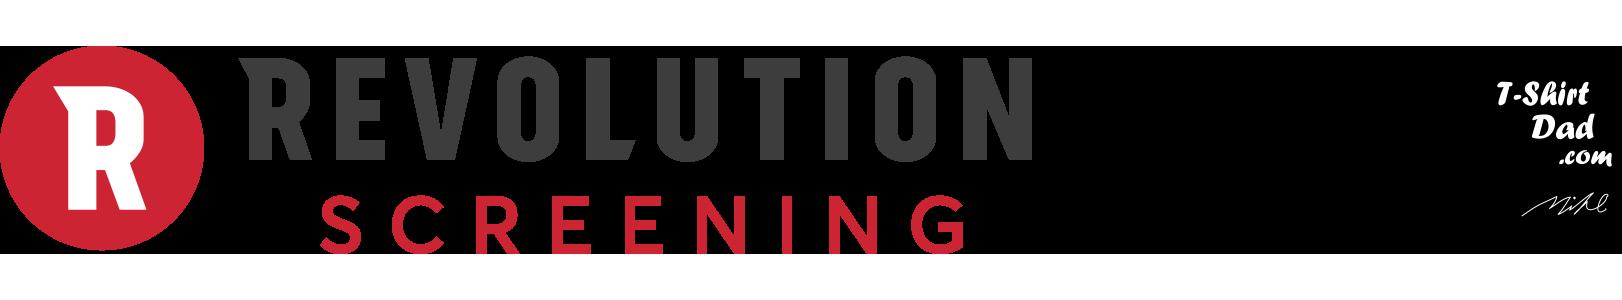 Revolution Screening and T-shirt dad logos